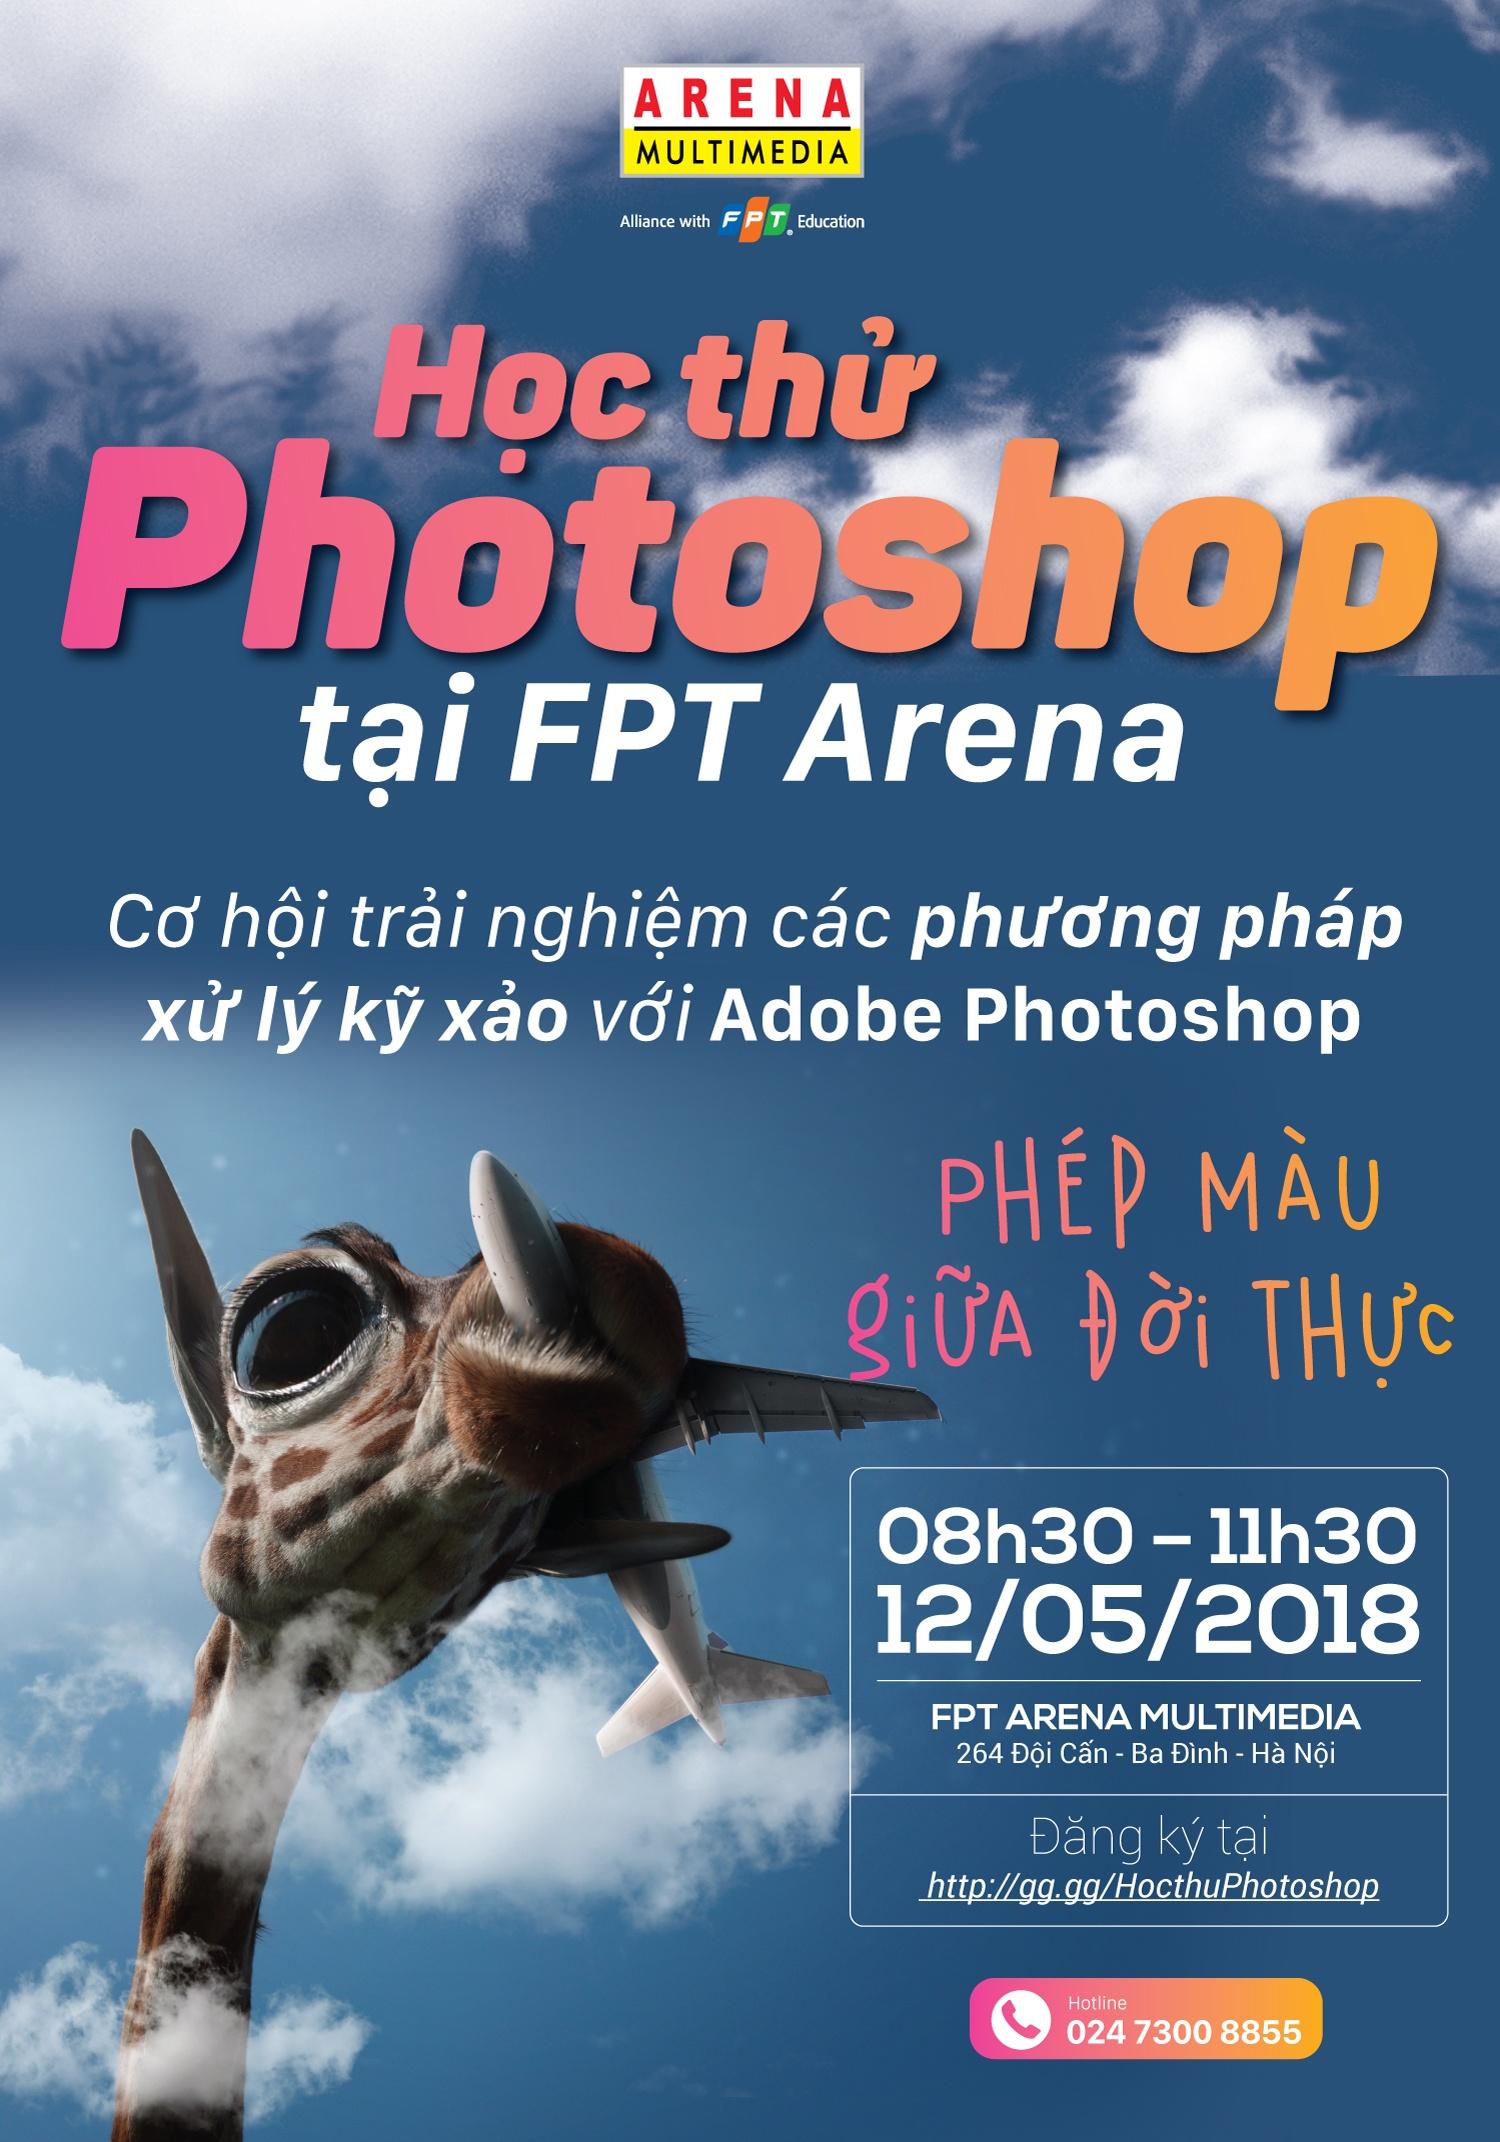 hocthuphotoshop-poster